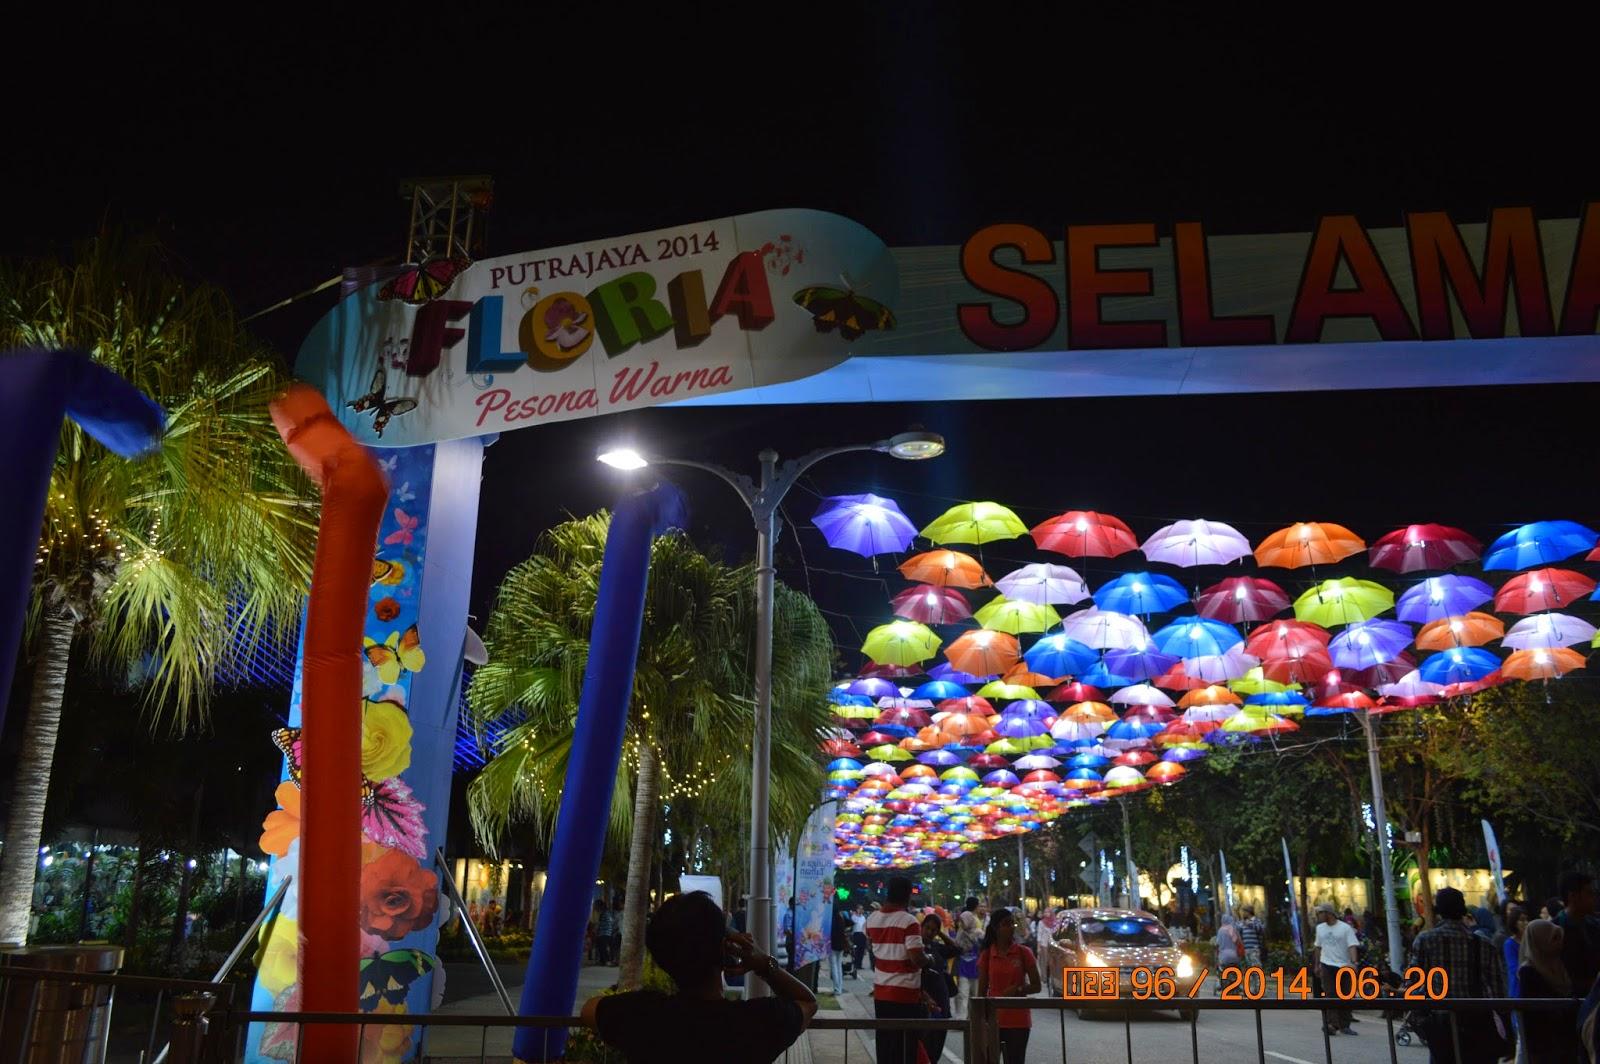 Pesta Floria Putrajaya 2014